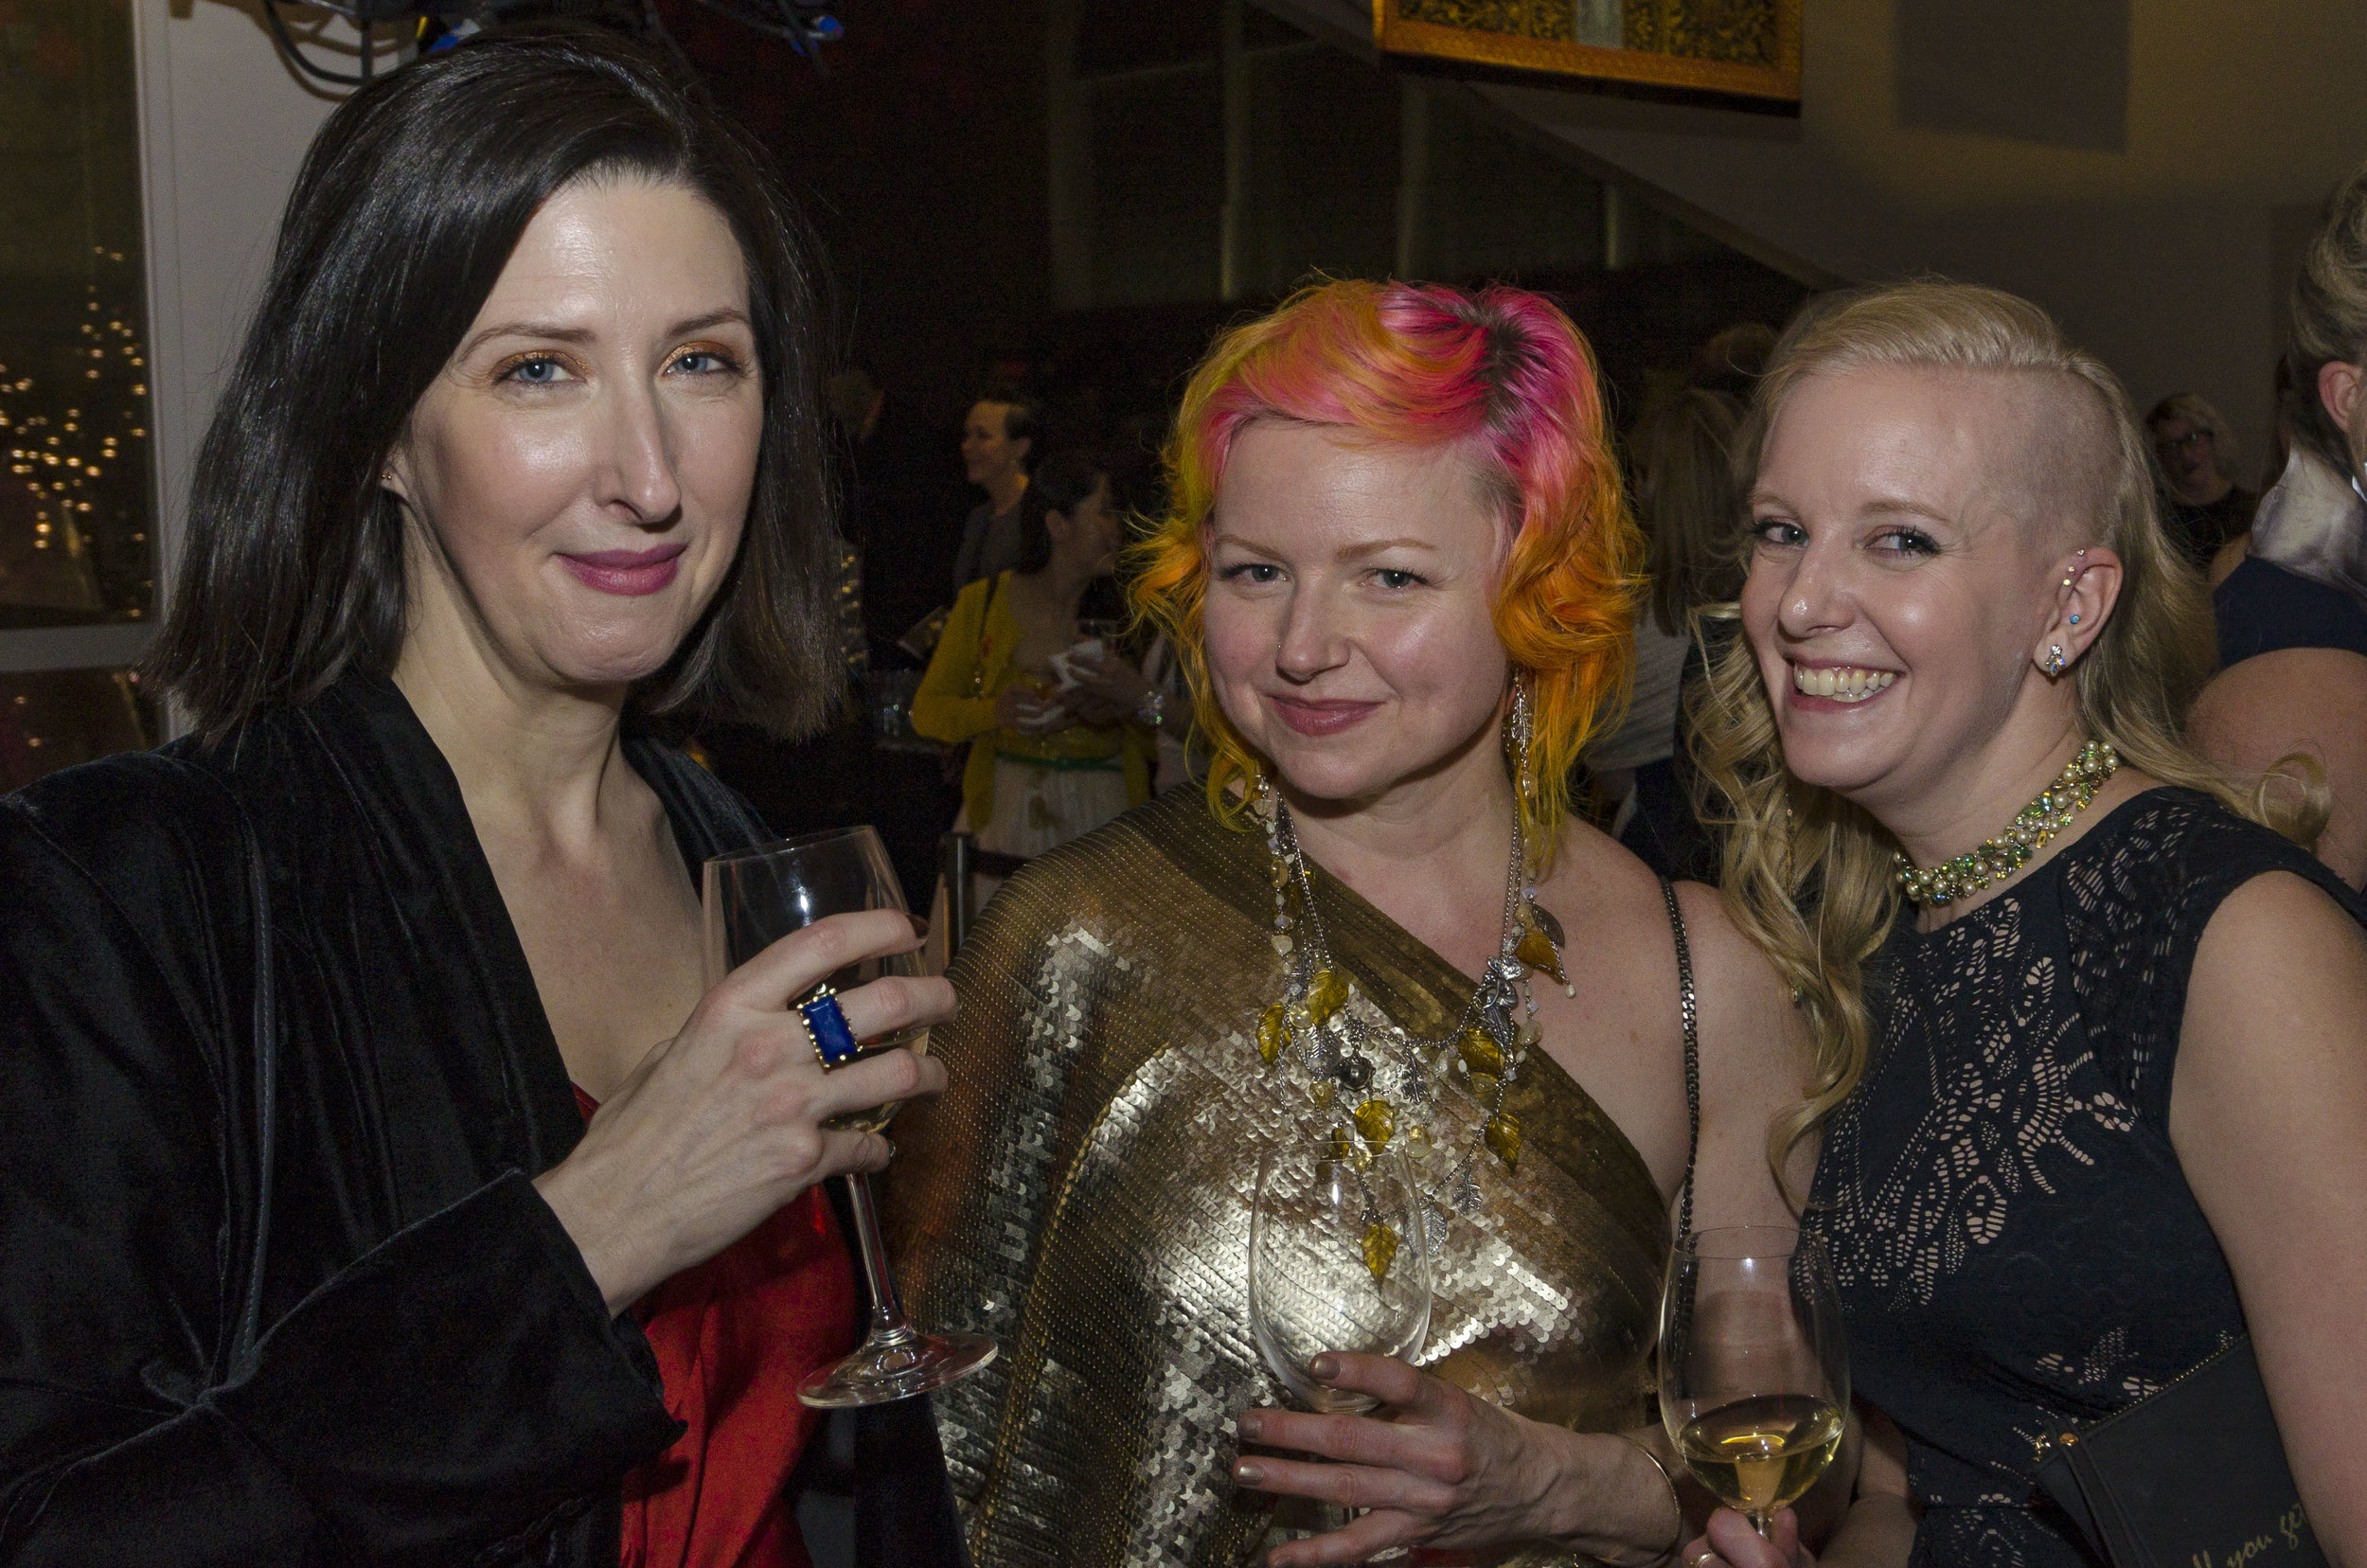 Shannon Pomakov, Darci Cheyne and Amanda Wood